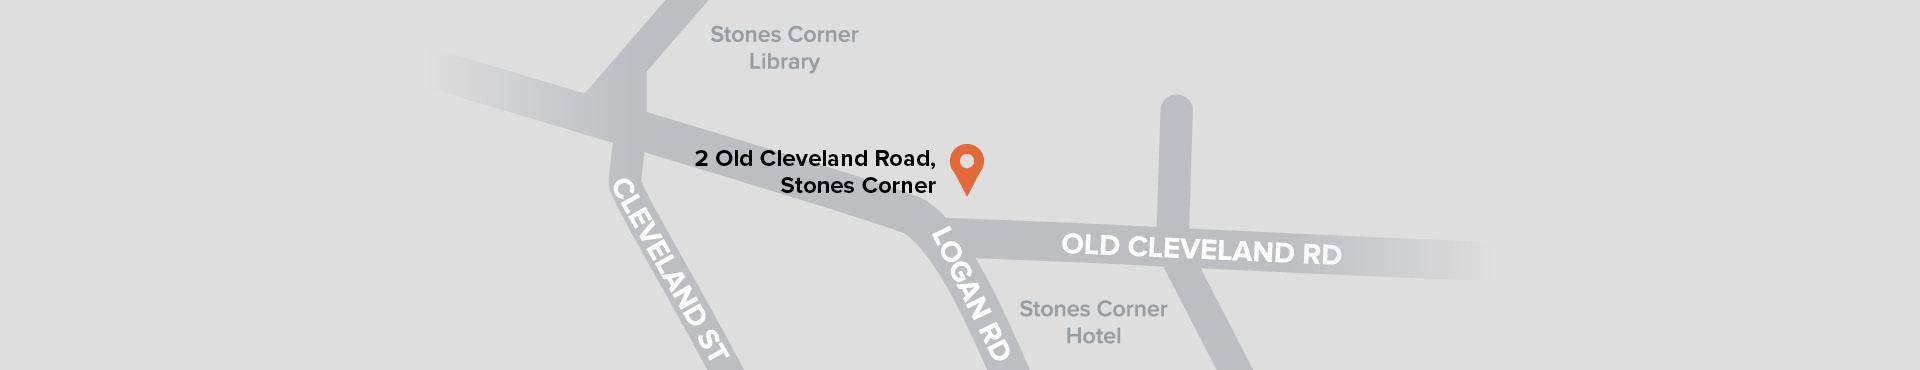 Stones Corner Shine Lawyers Location | Shine Lawyers